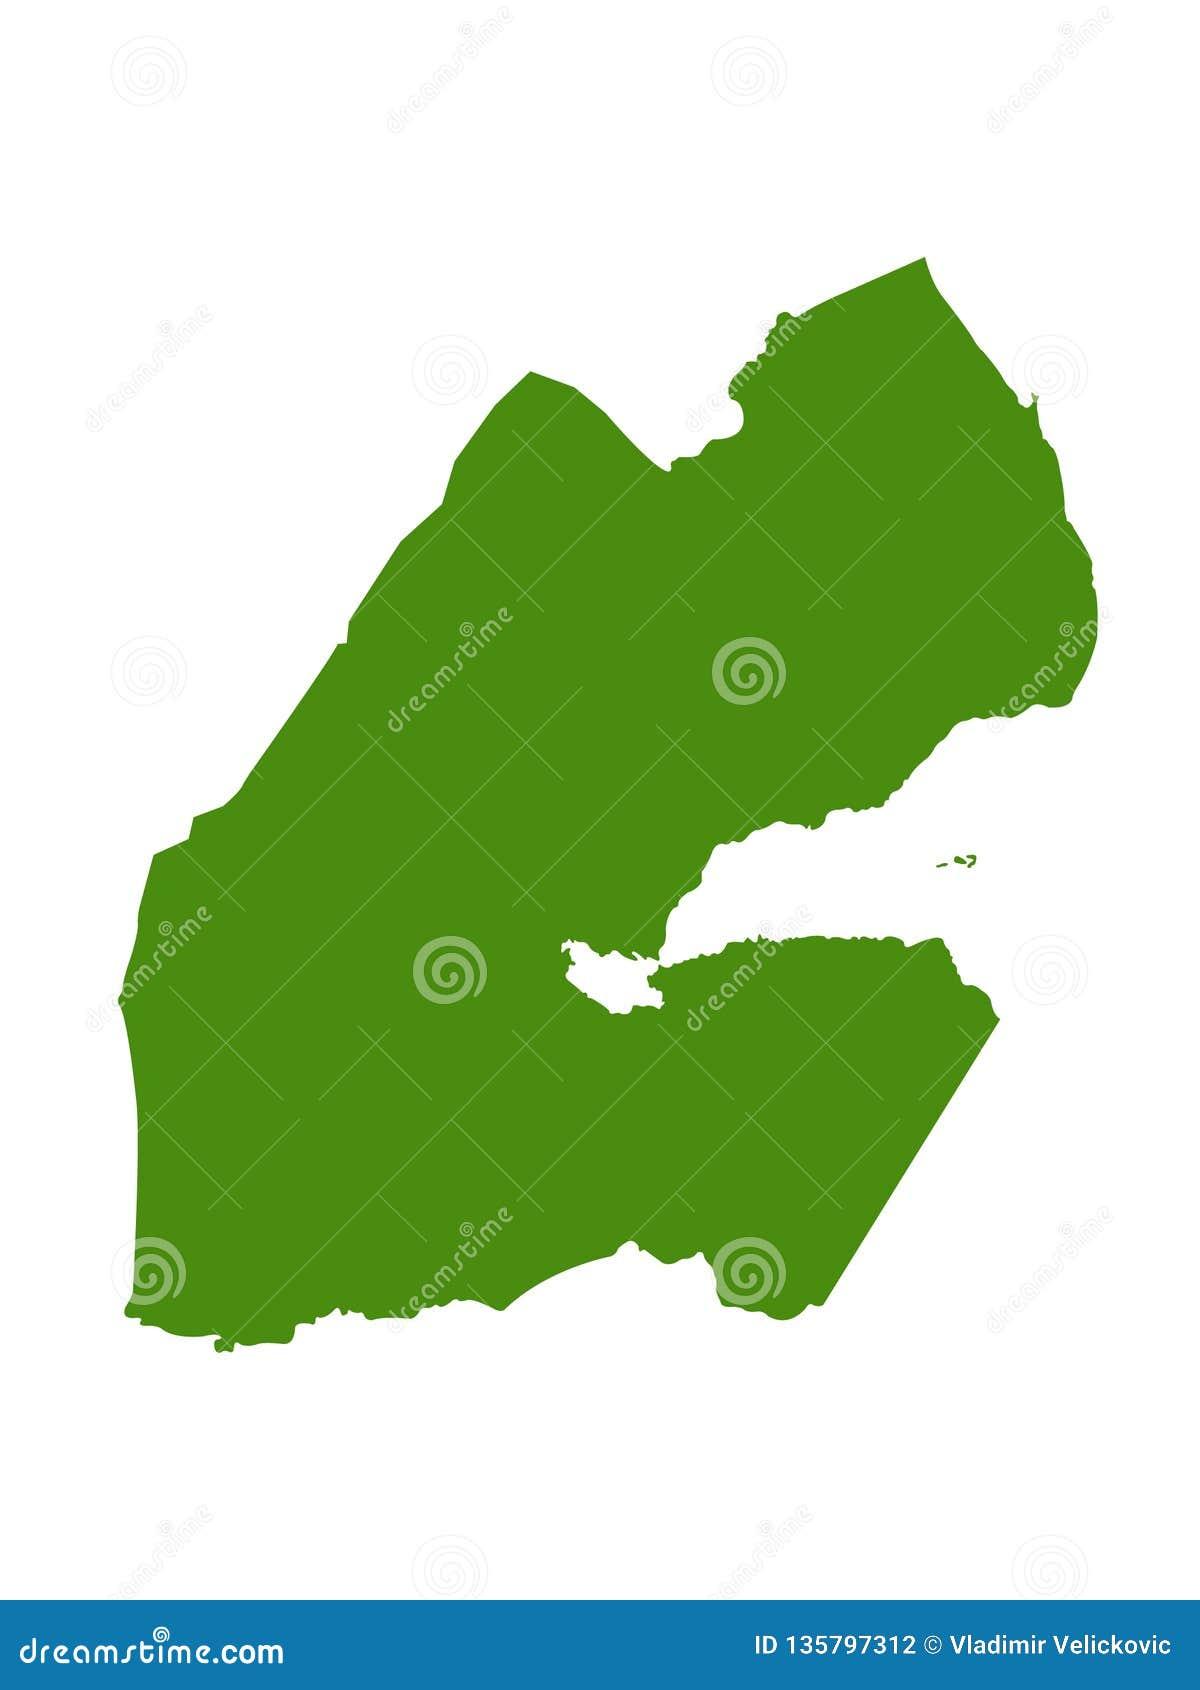 Djibouti Map - Republic Of Djibouti Stock Vector - Illustration of ...